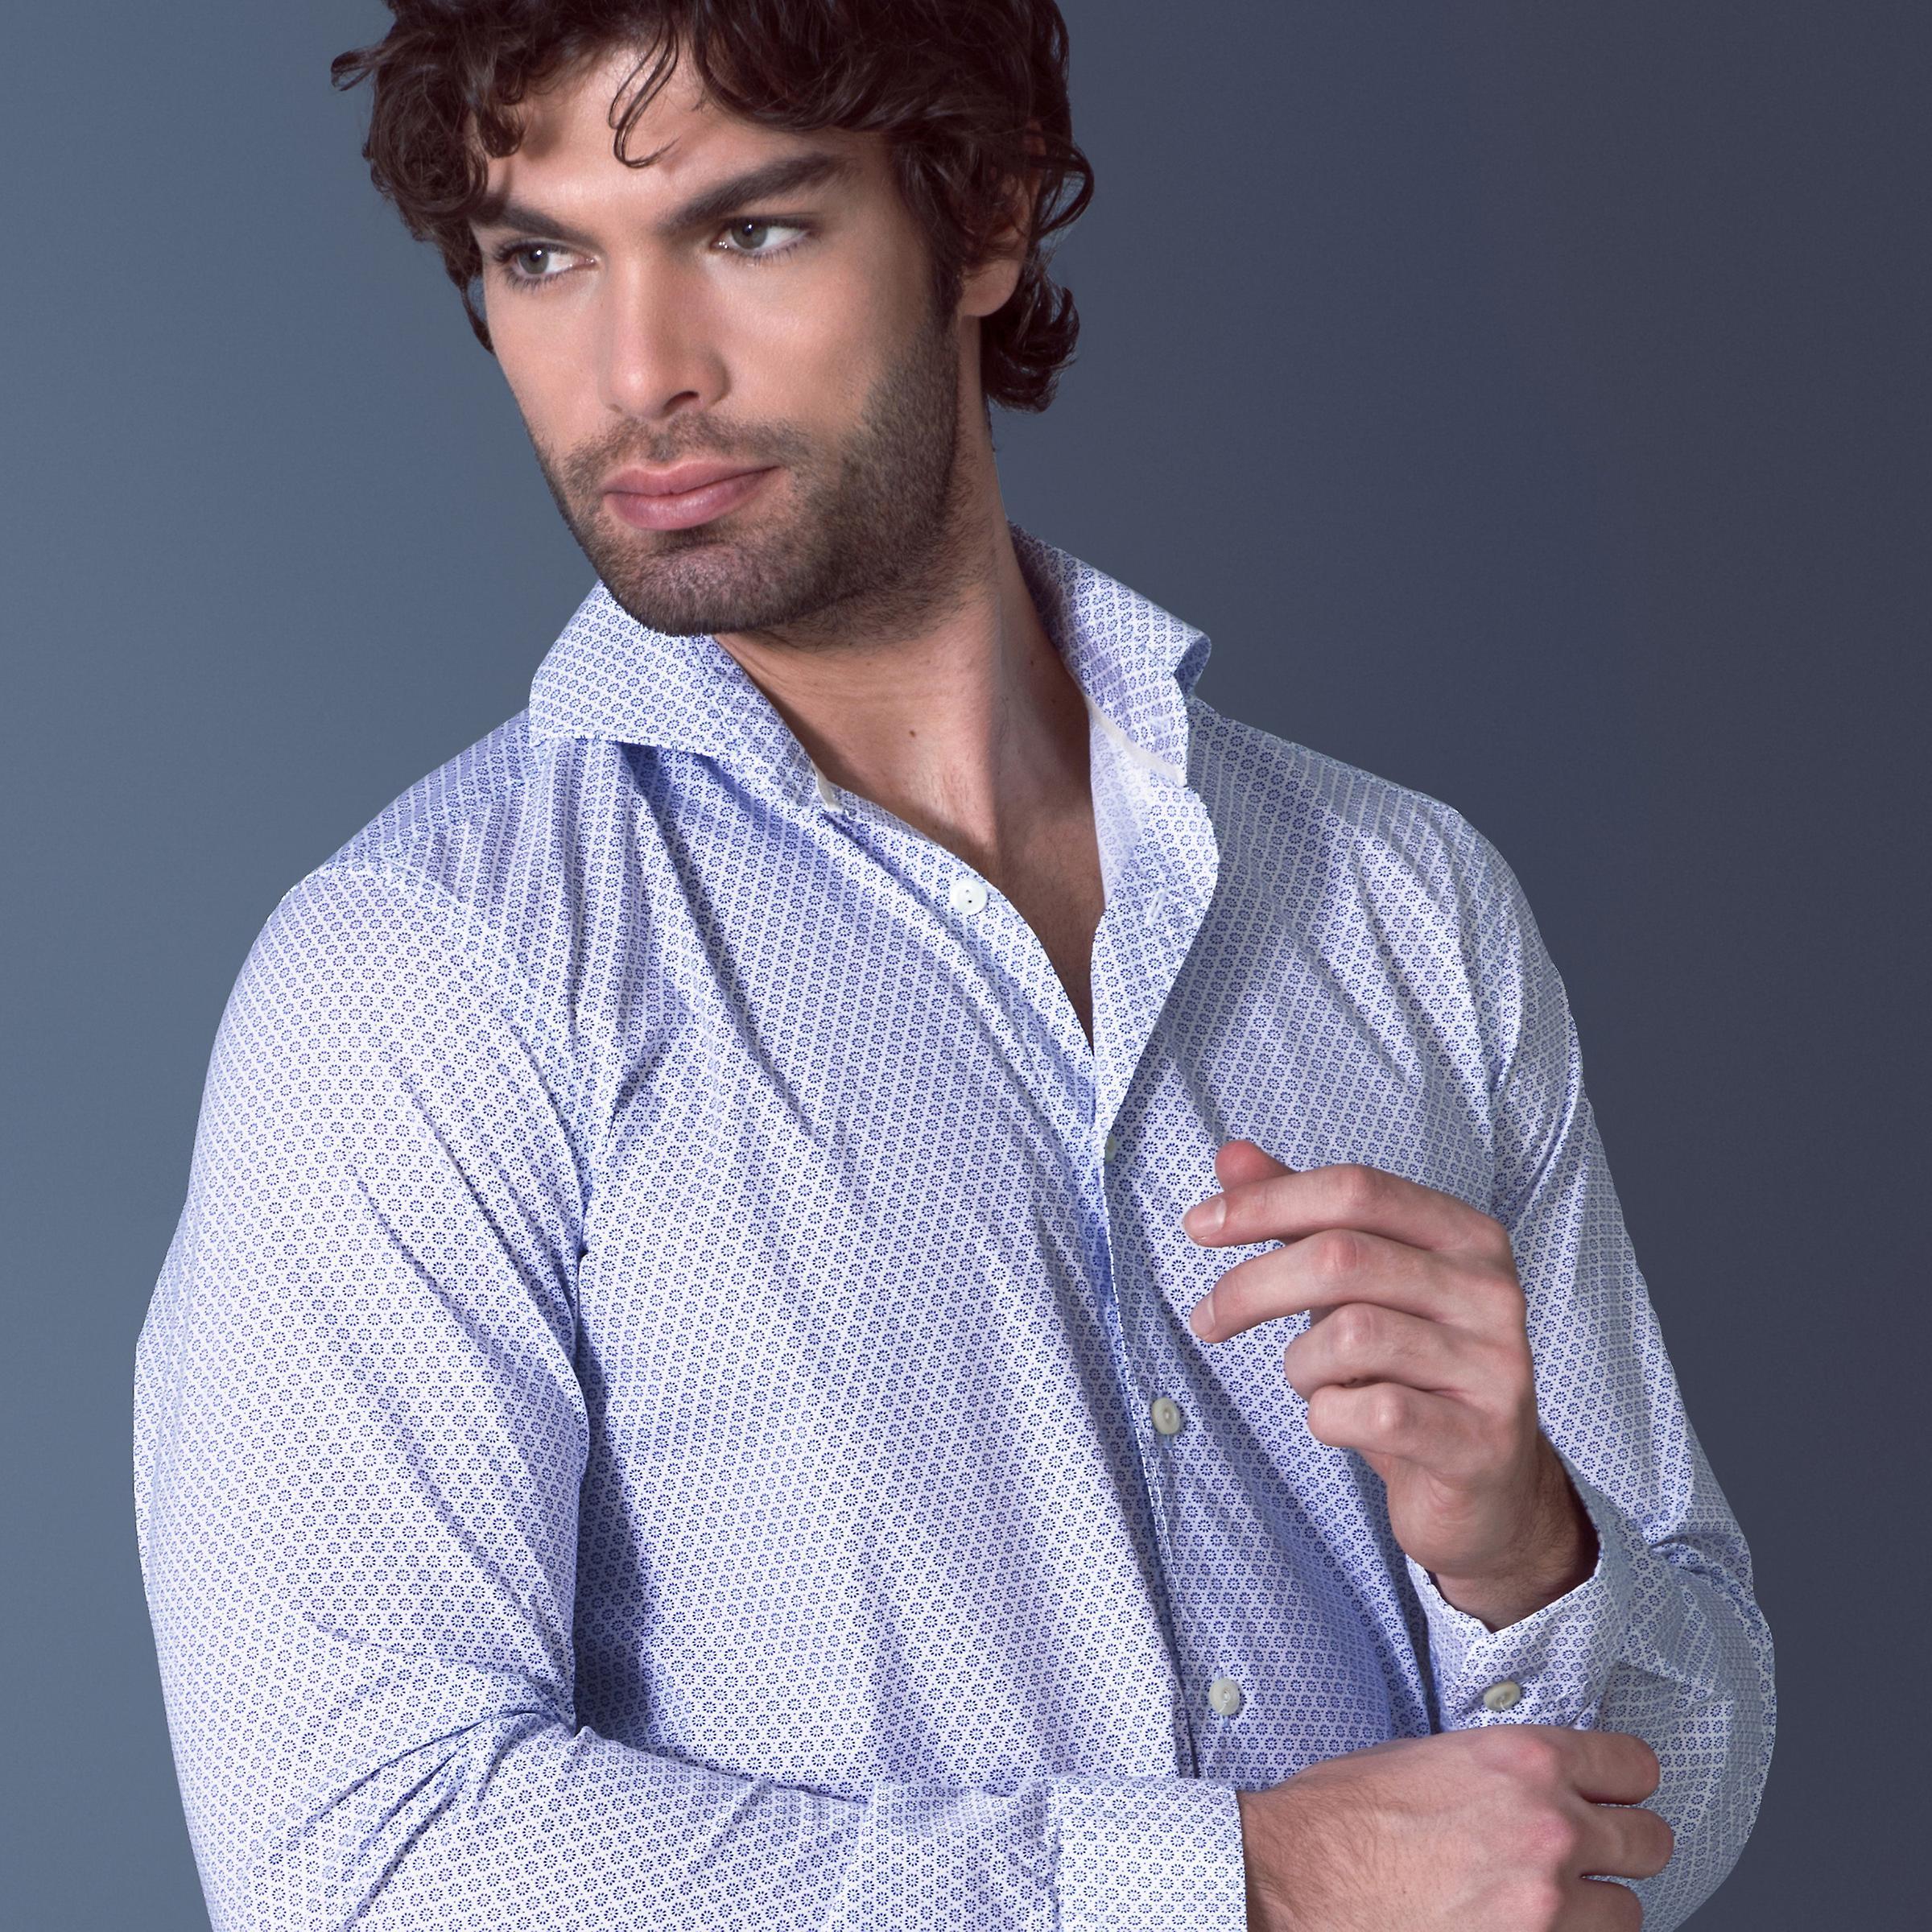 Fabio Giovanni Miggiano Shirt - Lightweight Poplin Cotton Italian Casual Shirt